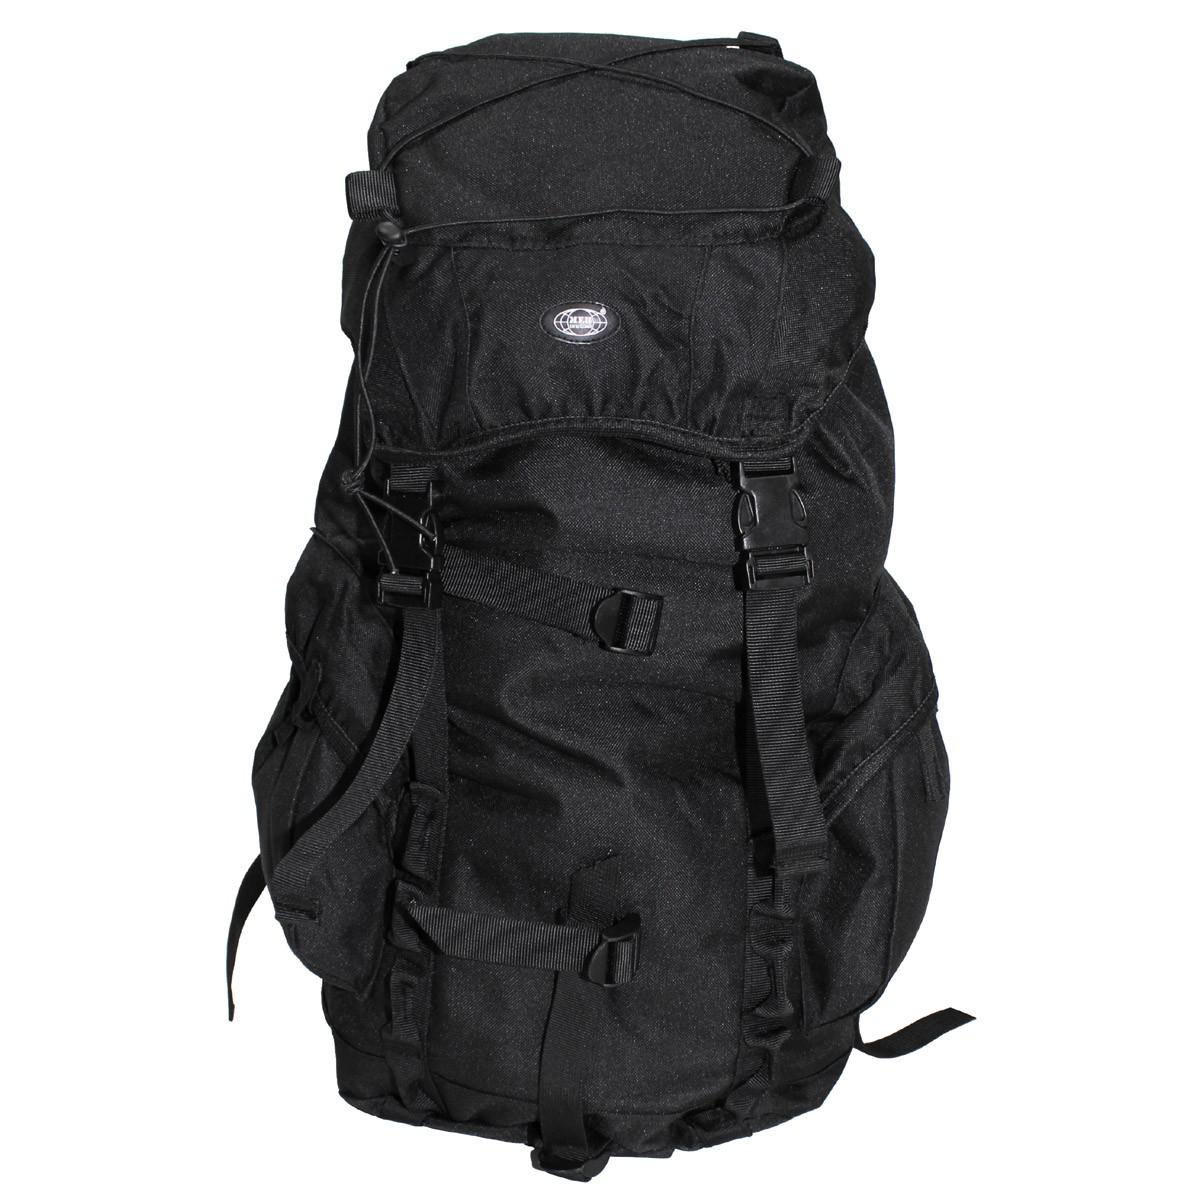 Batoh Recon 3 černý 35L